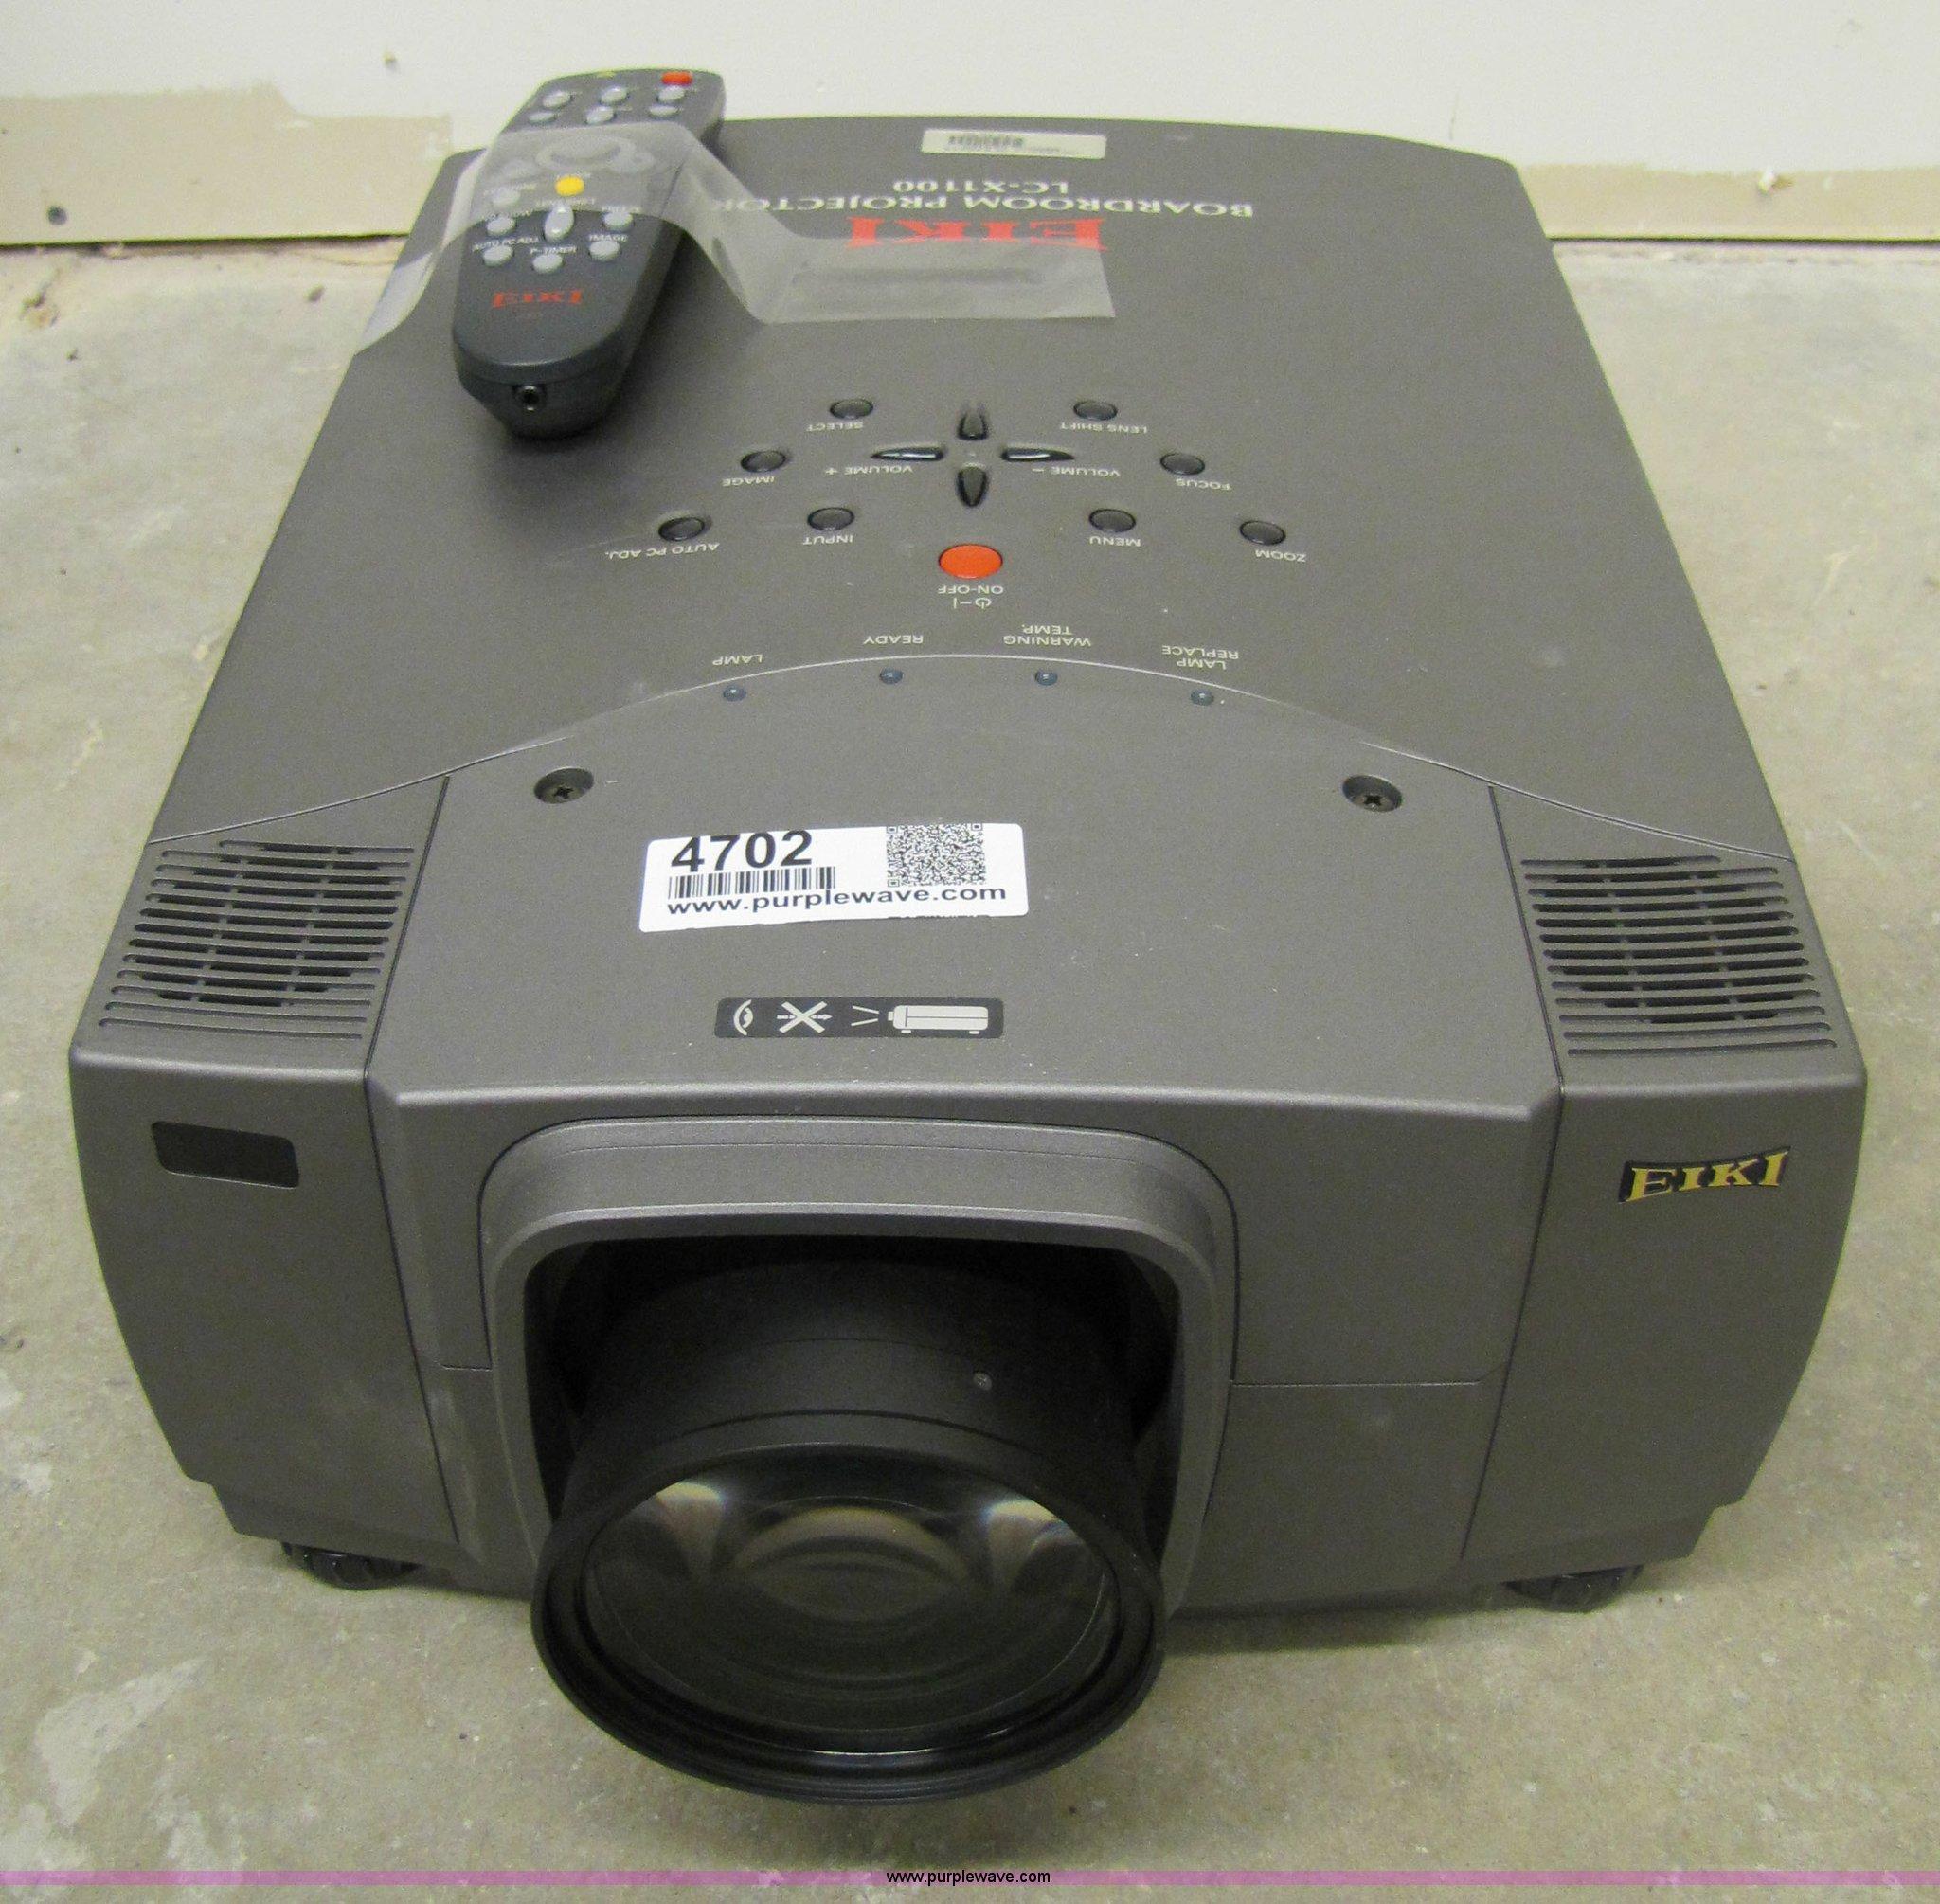 EIKI LC-X1100 WINDOWS 10 DOWNLOAD DRIVER